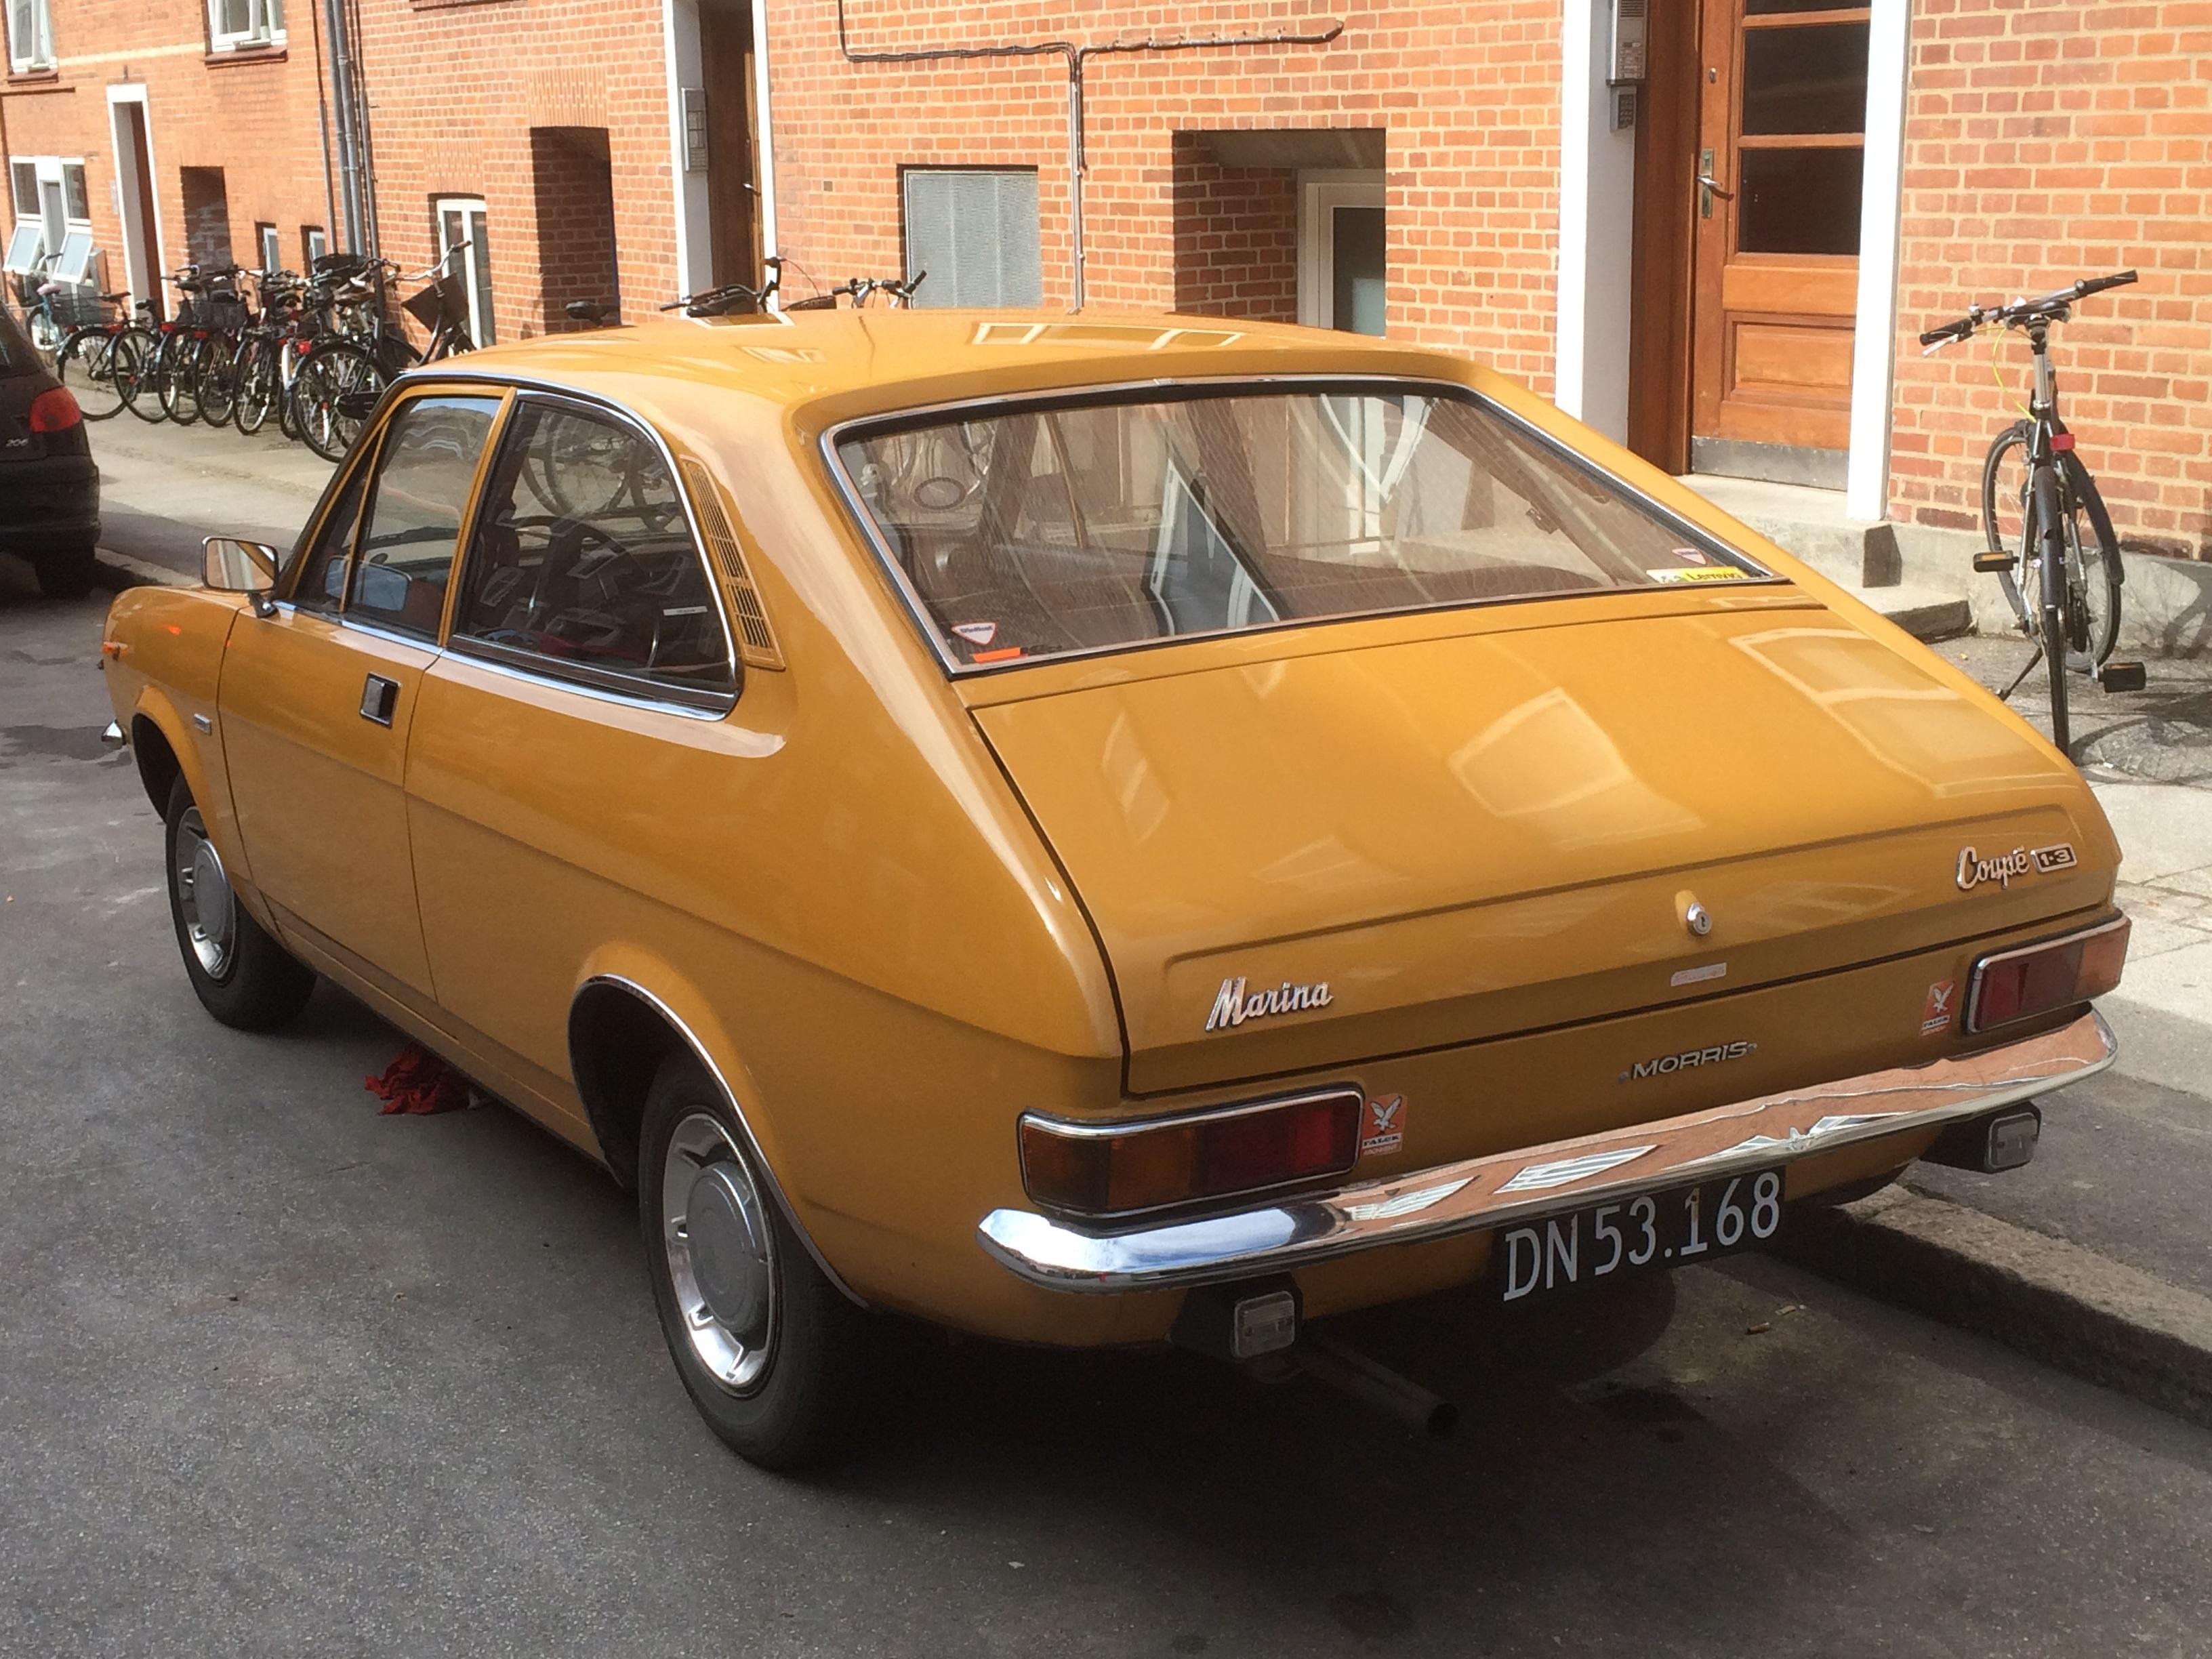 Morris Marina 1971 - 1980 Coupe #4